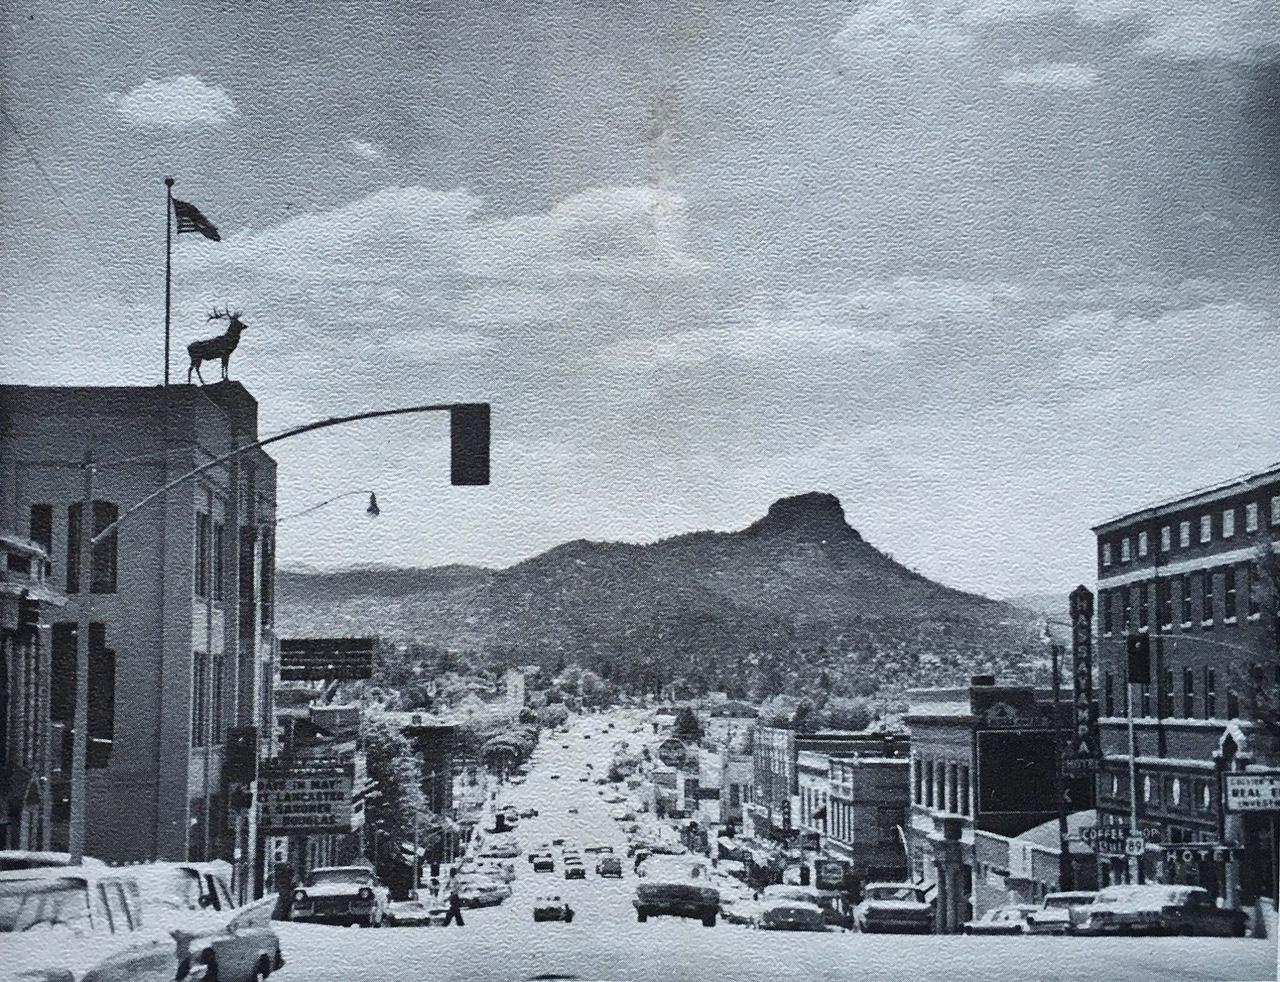 Historic Image of Downtown Prescott, AZ Donny Karcie, MBA RE/MAX Mountain Properties 731 W Gurley Street / Prescott, AZ 86305 (928) 899-4772 http://www.featureprescott.com